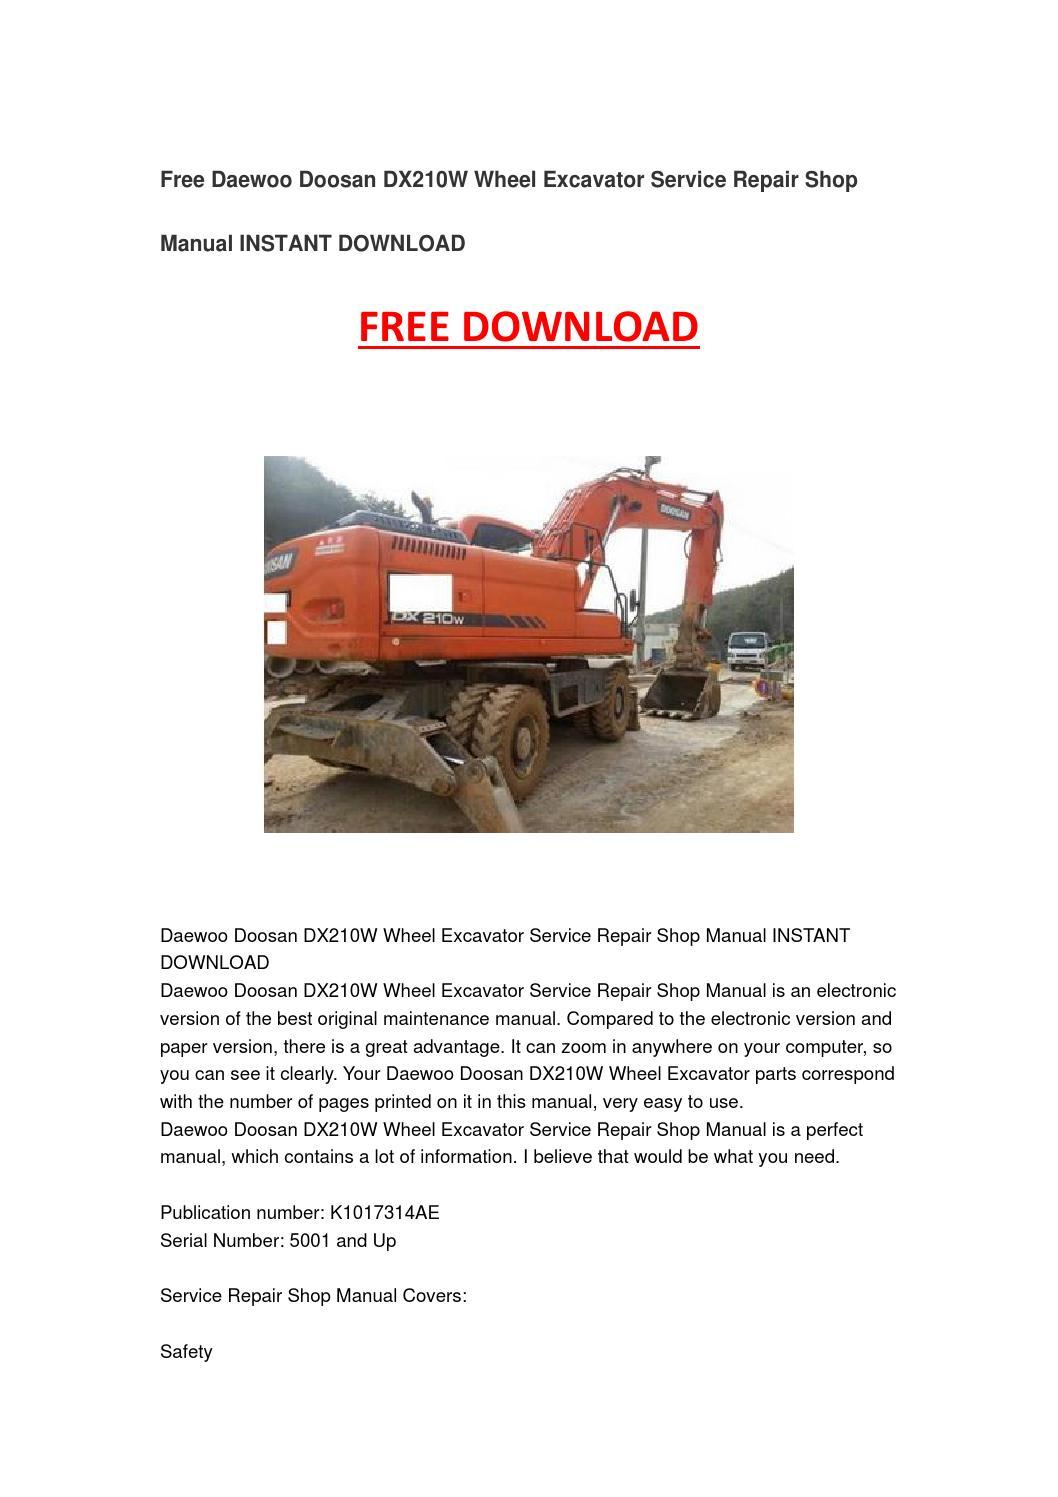 Daewoo doosan dx210w wheel excavator service repair shop manual instant  download by Lee Xiaoxiao - issuu